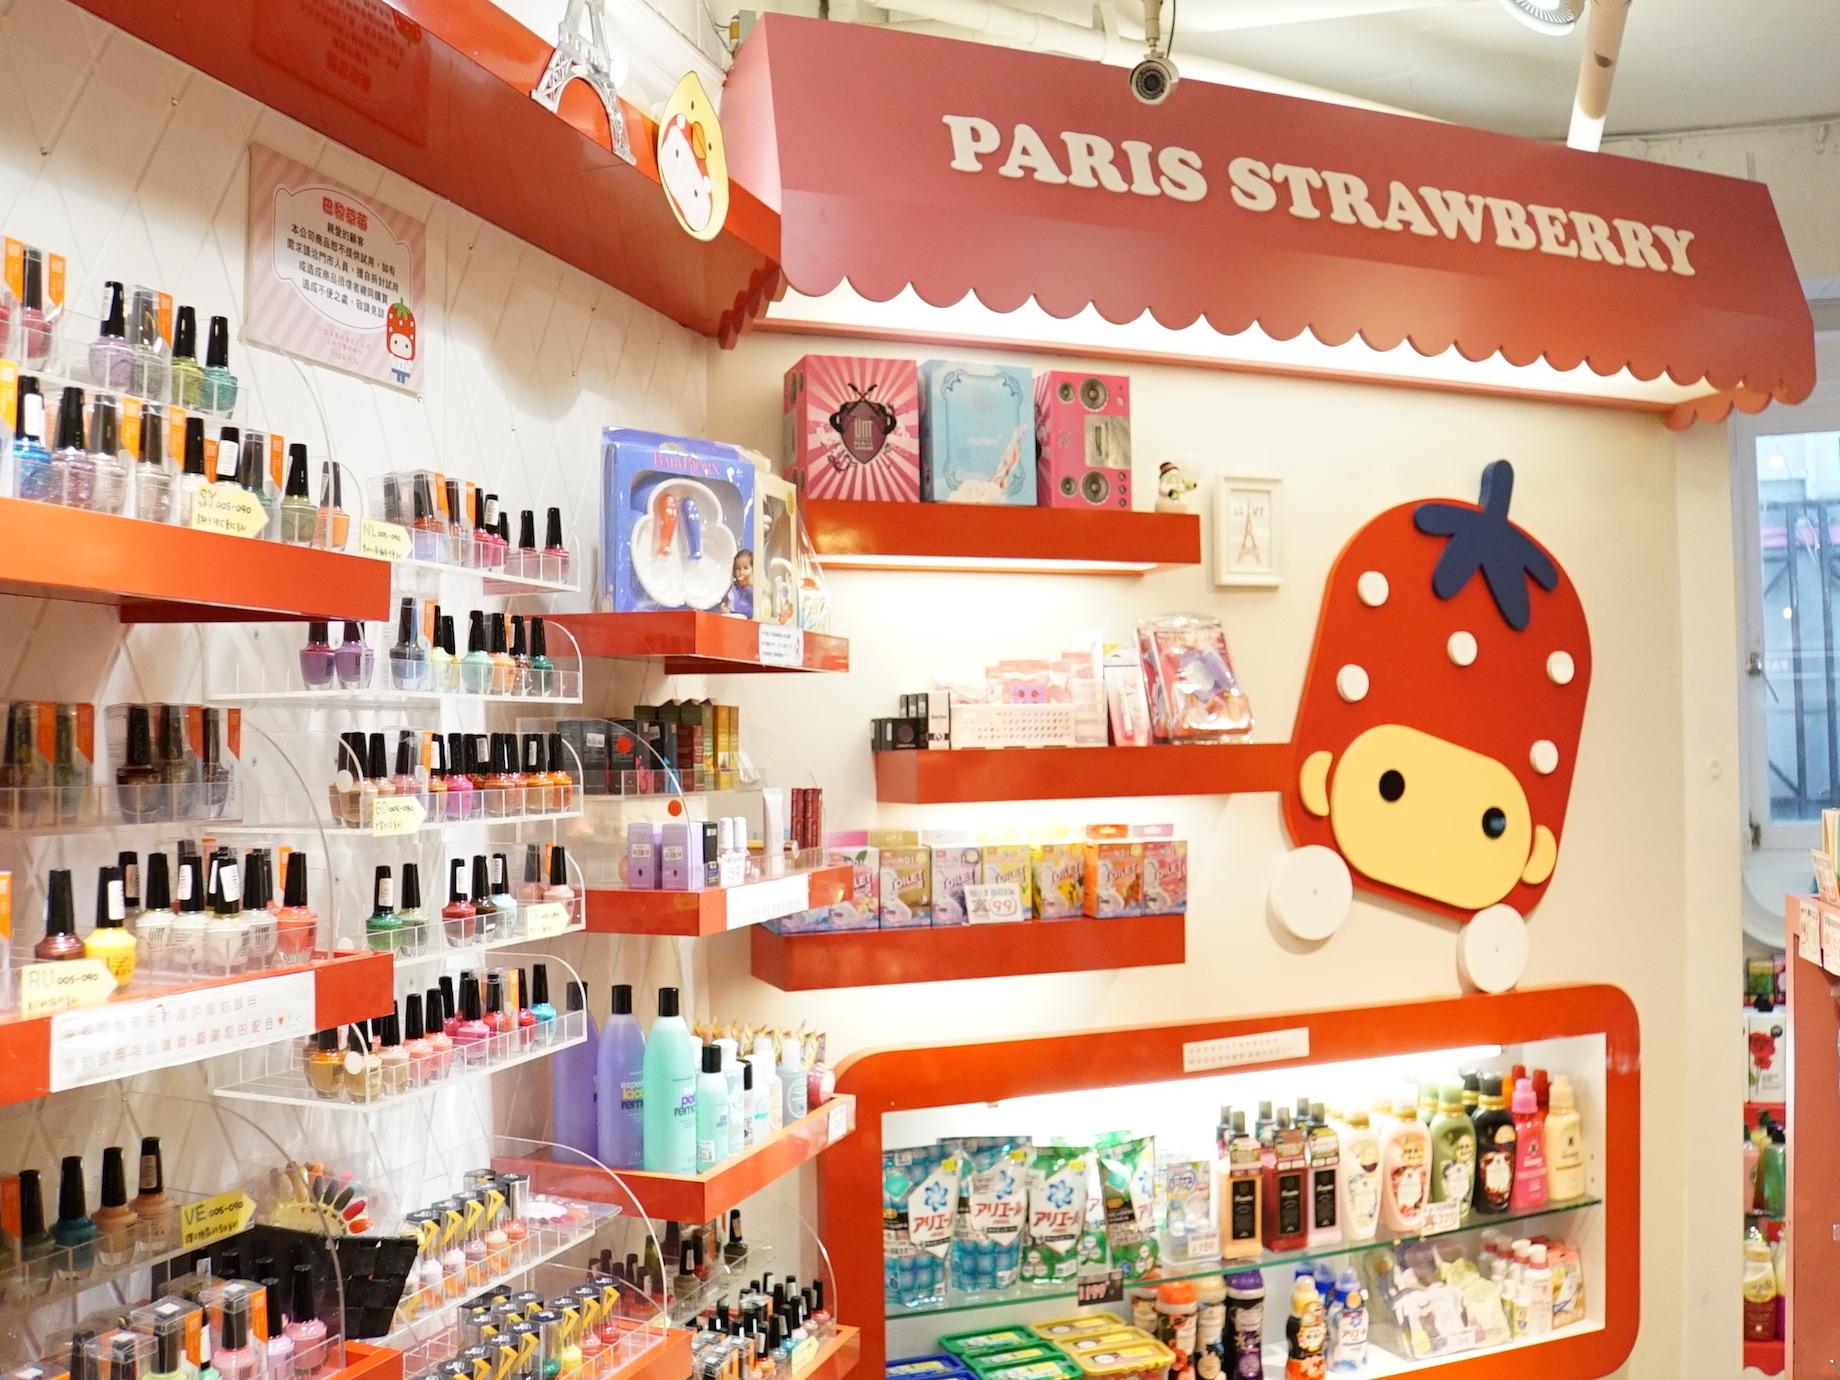 SmartM電子商務學院》新客熟客不漏網,巴黎草莓經營多通路的3大策略